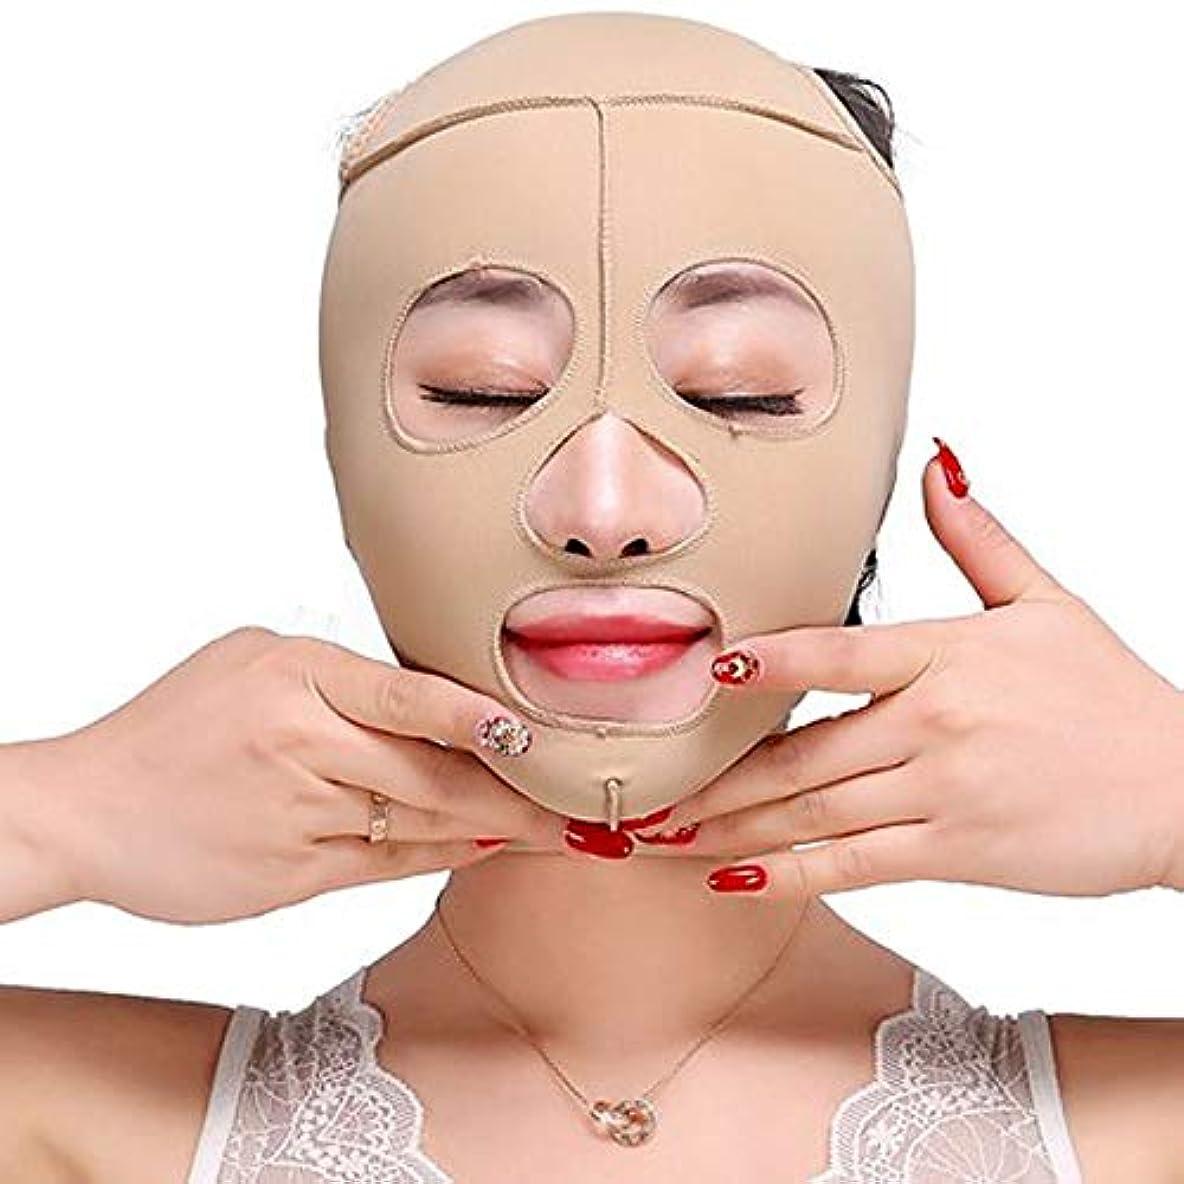 GLJJQMY フェイシャルリフティングフェイシャルVマスクダブルあご薄い顔包帯抗シワリフティングチークライン 顔用整形マスク (Size : M)